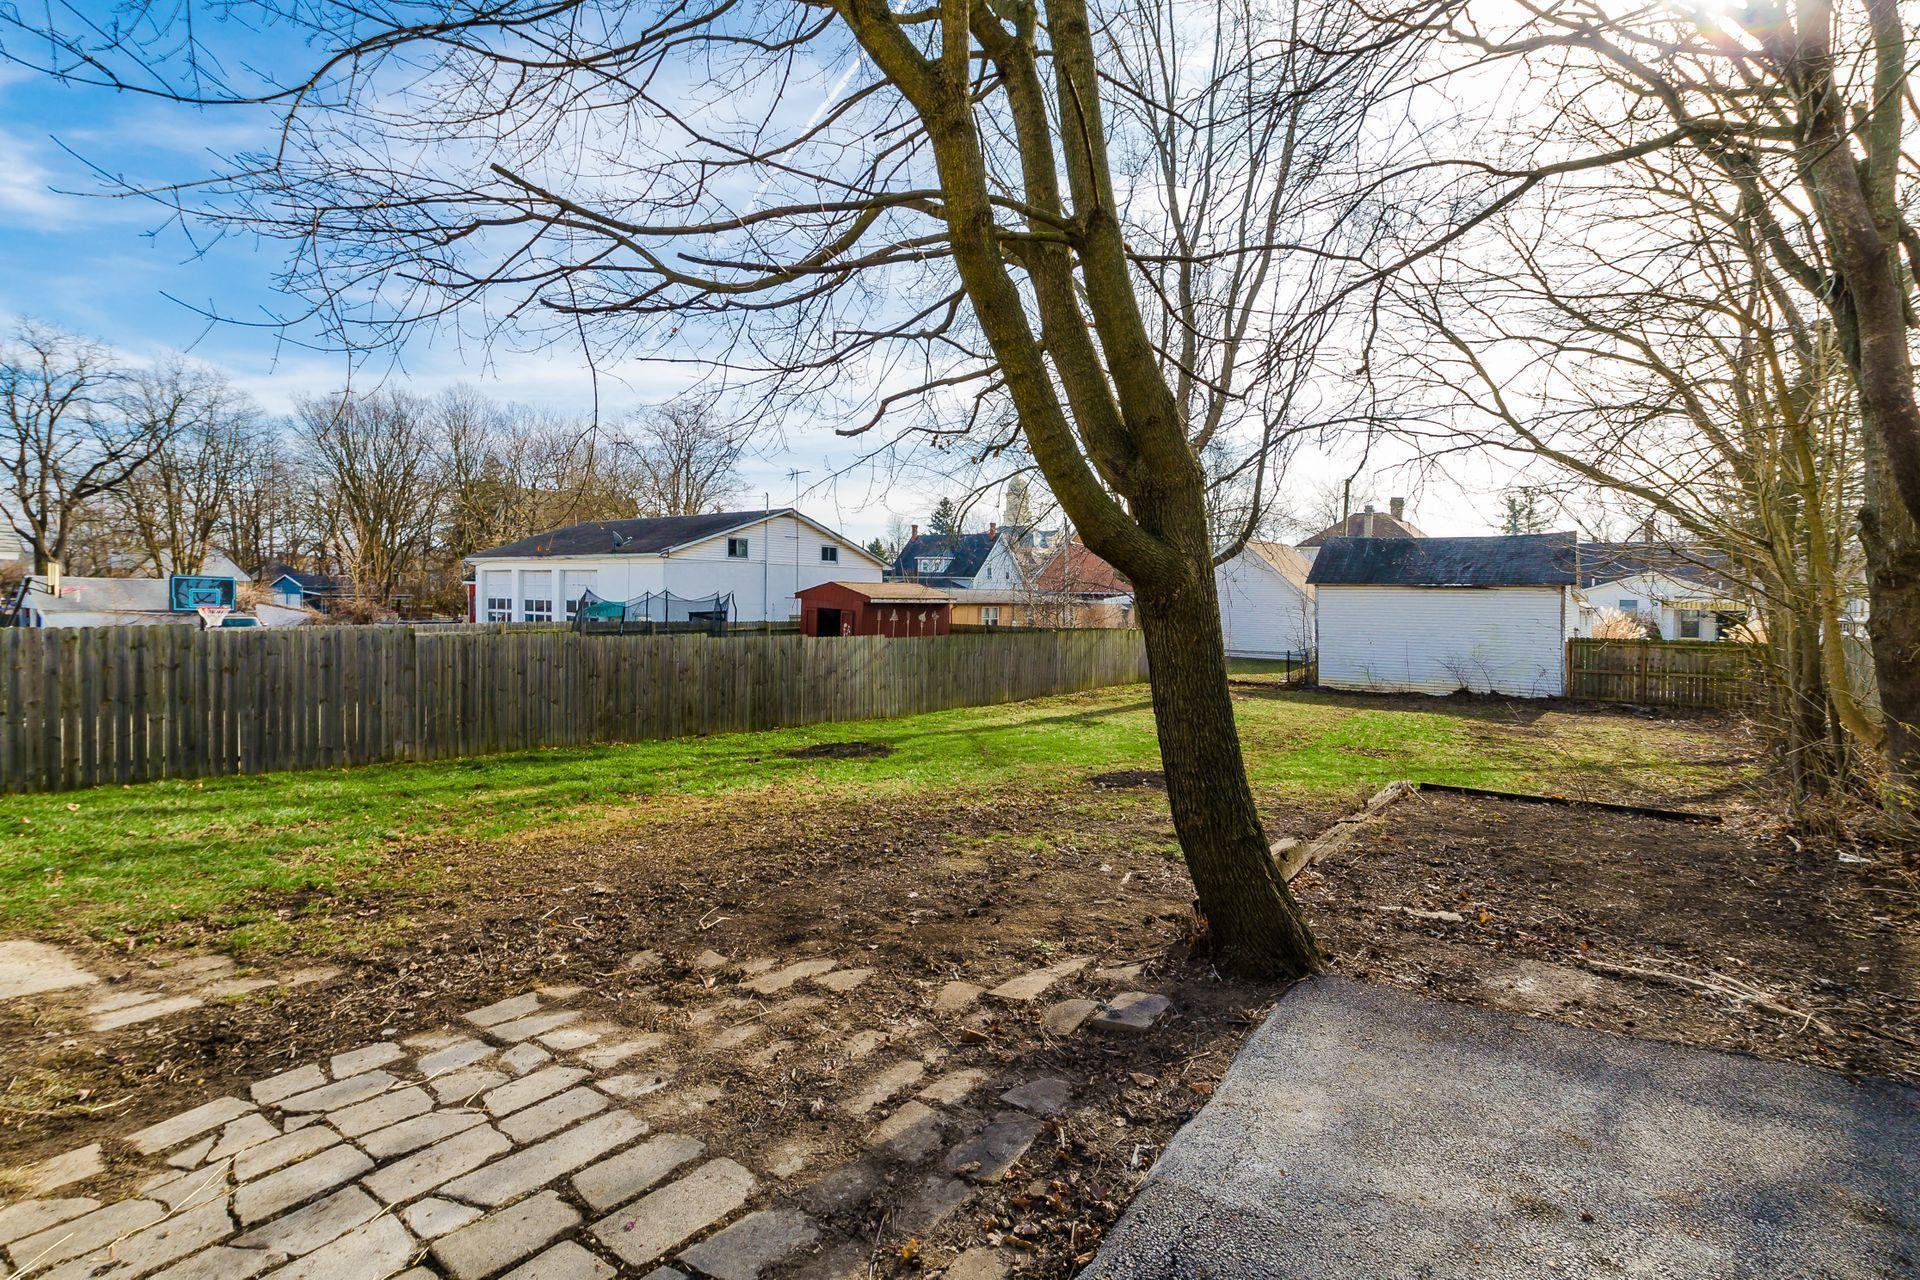 271 3rd Street, Marysville, Ohio 43040, 3 Bedrooms Bedrooms, ,2 BathroomsBathrooms,Residential,For Sale,3rd,221001150